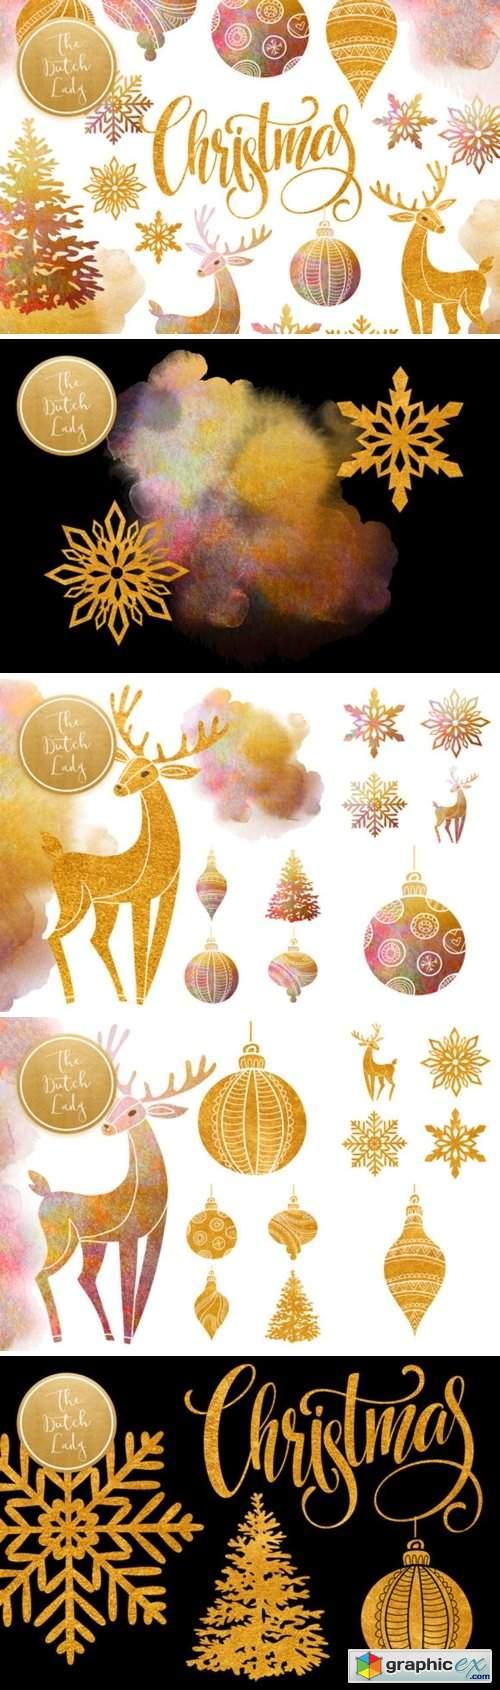 Christmas Ornaments Clipart Set